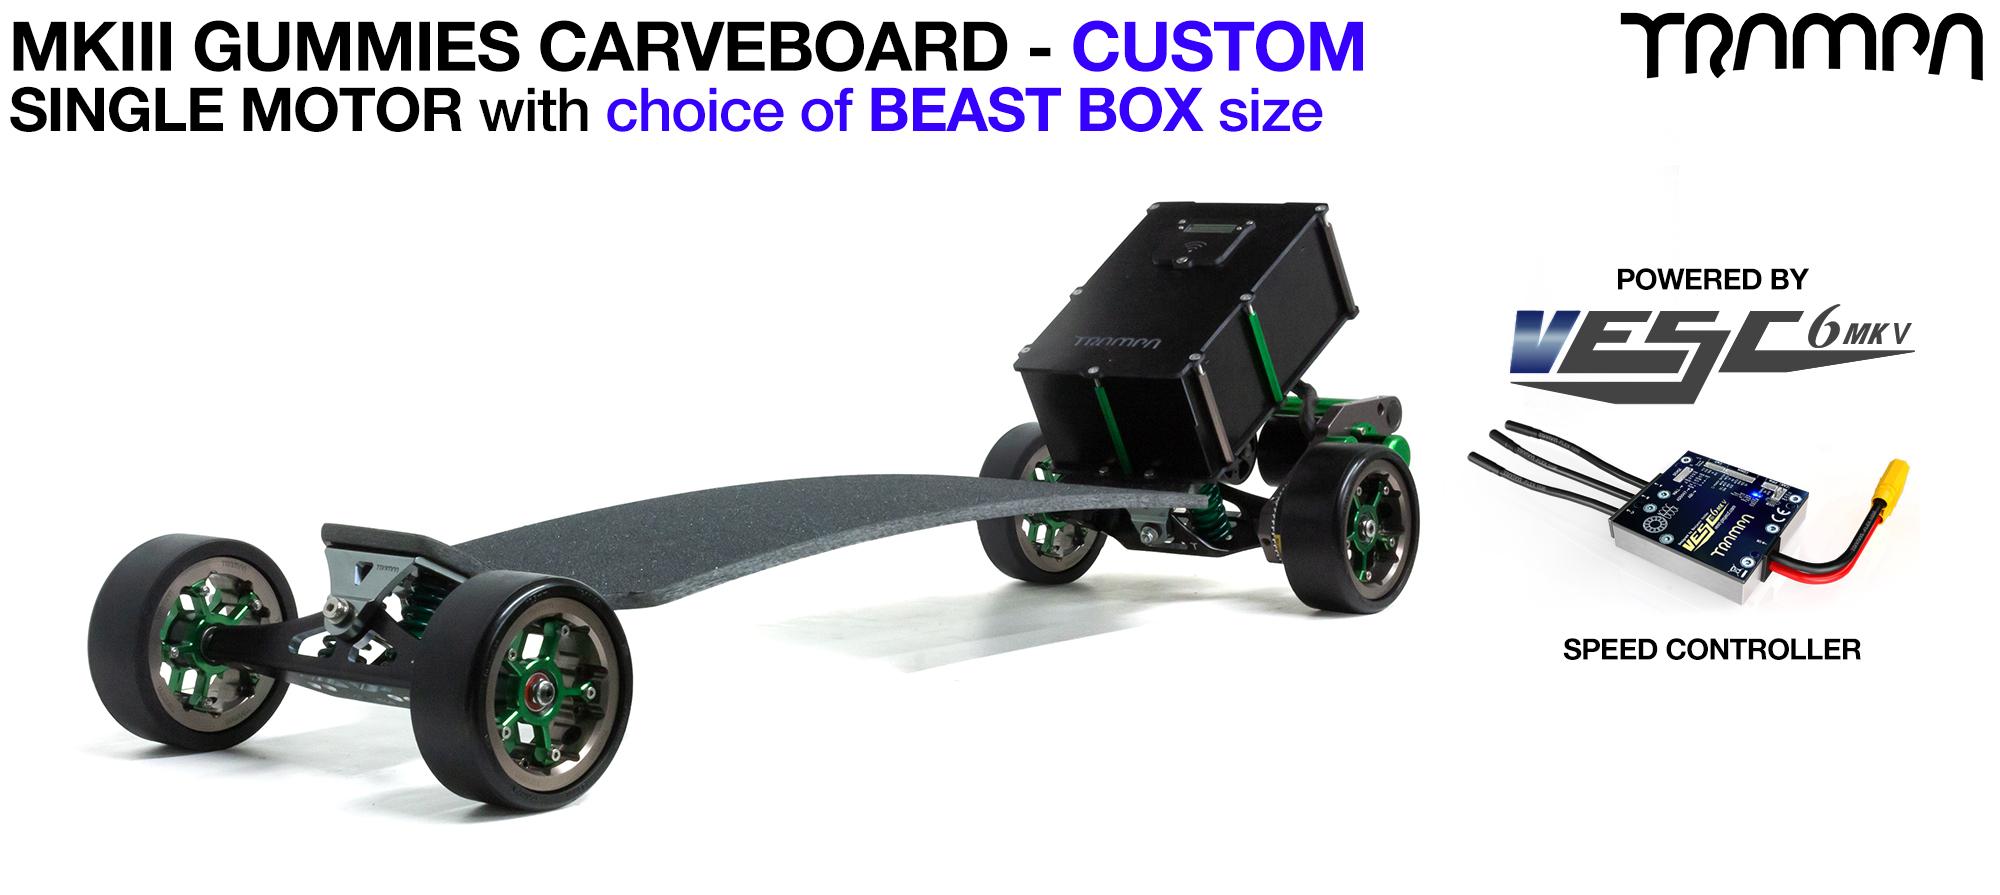 TRAMPA's MkIII Electric GUMMIES Carveboard - uses Mini Spring Trucks with MkIII Carve board Motor Mount,s Custom TRAMPA hubs & 125mm GUMMIES longboard Tyres - SINGLE Motor CUSTOM